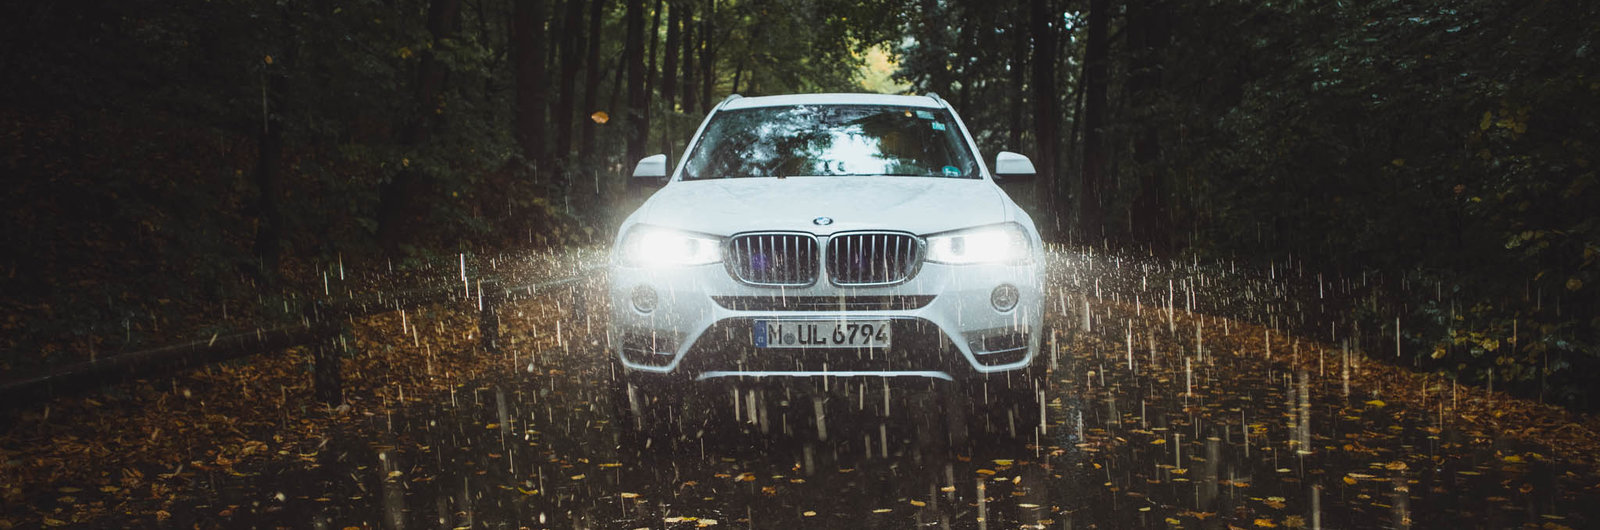 BMW X3 white